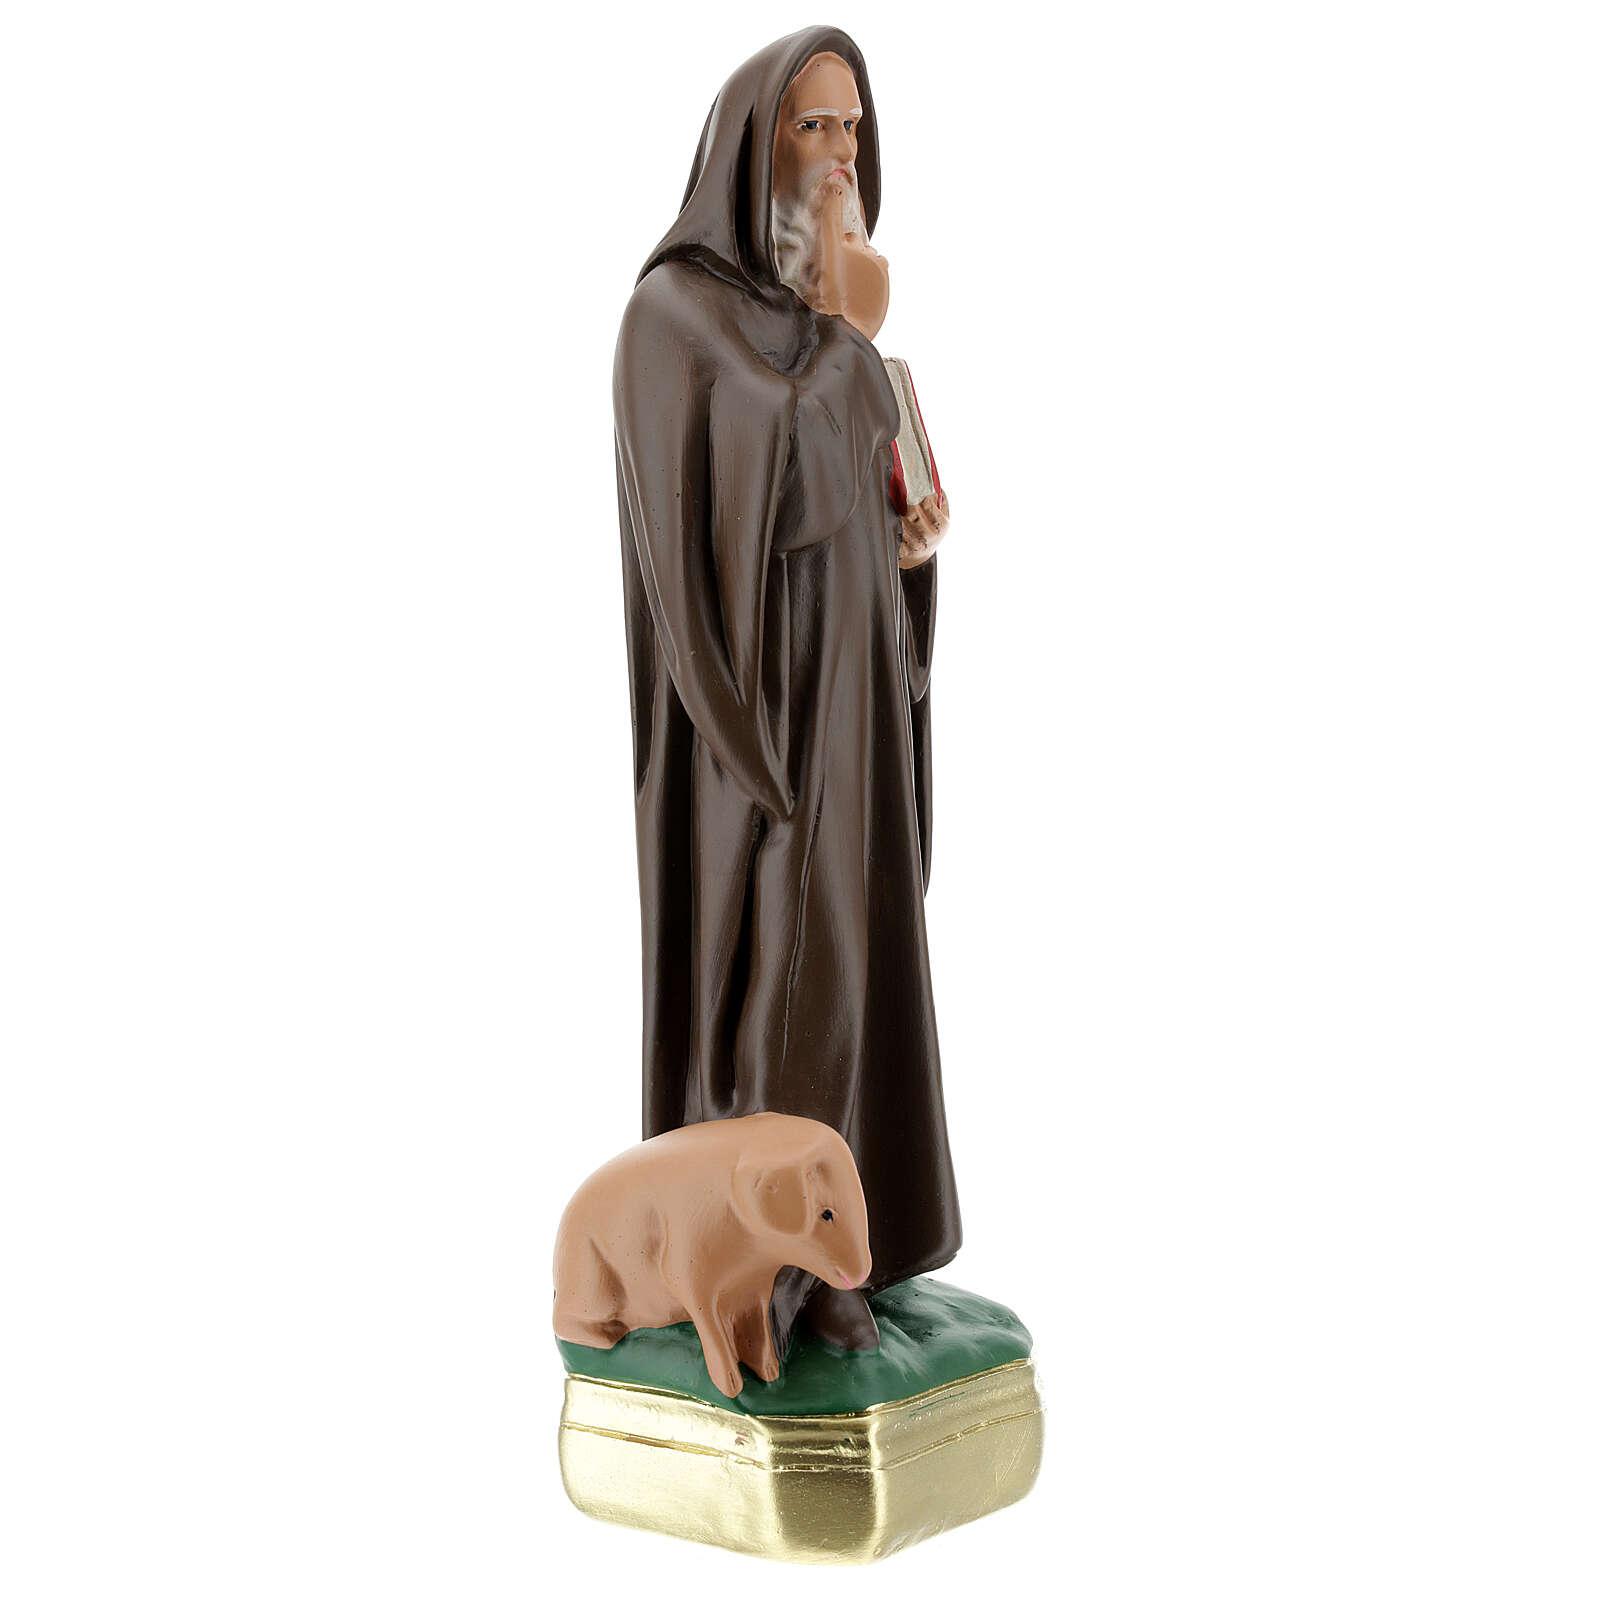 St. Anthony Abbot plaster statue 30 cm hand painted Arte Barsanti 4